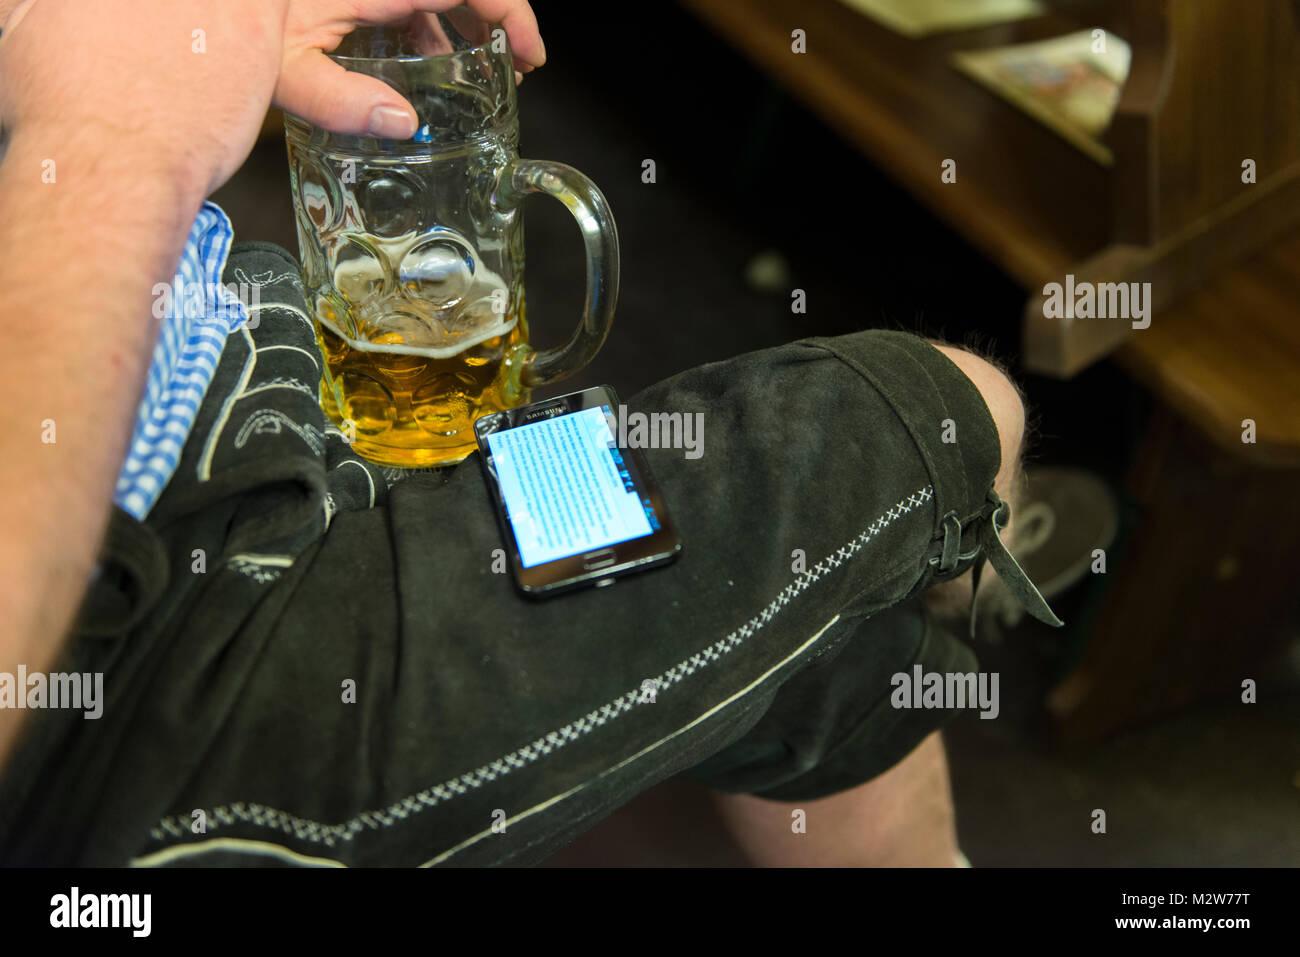 Beer mug and Lederhosen, Oktoberfest - Stock Image